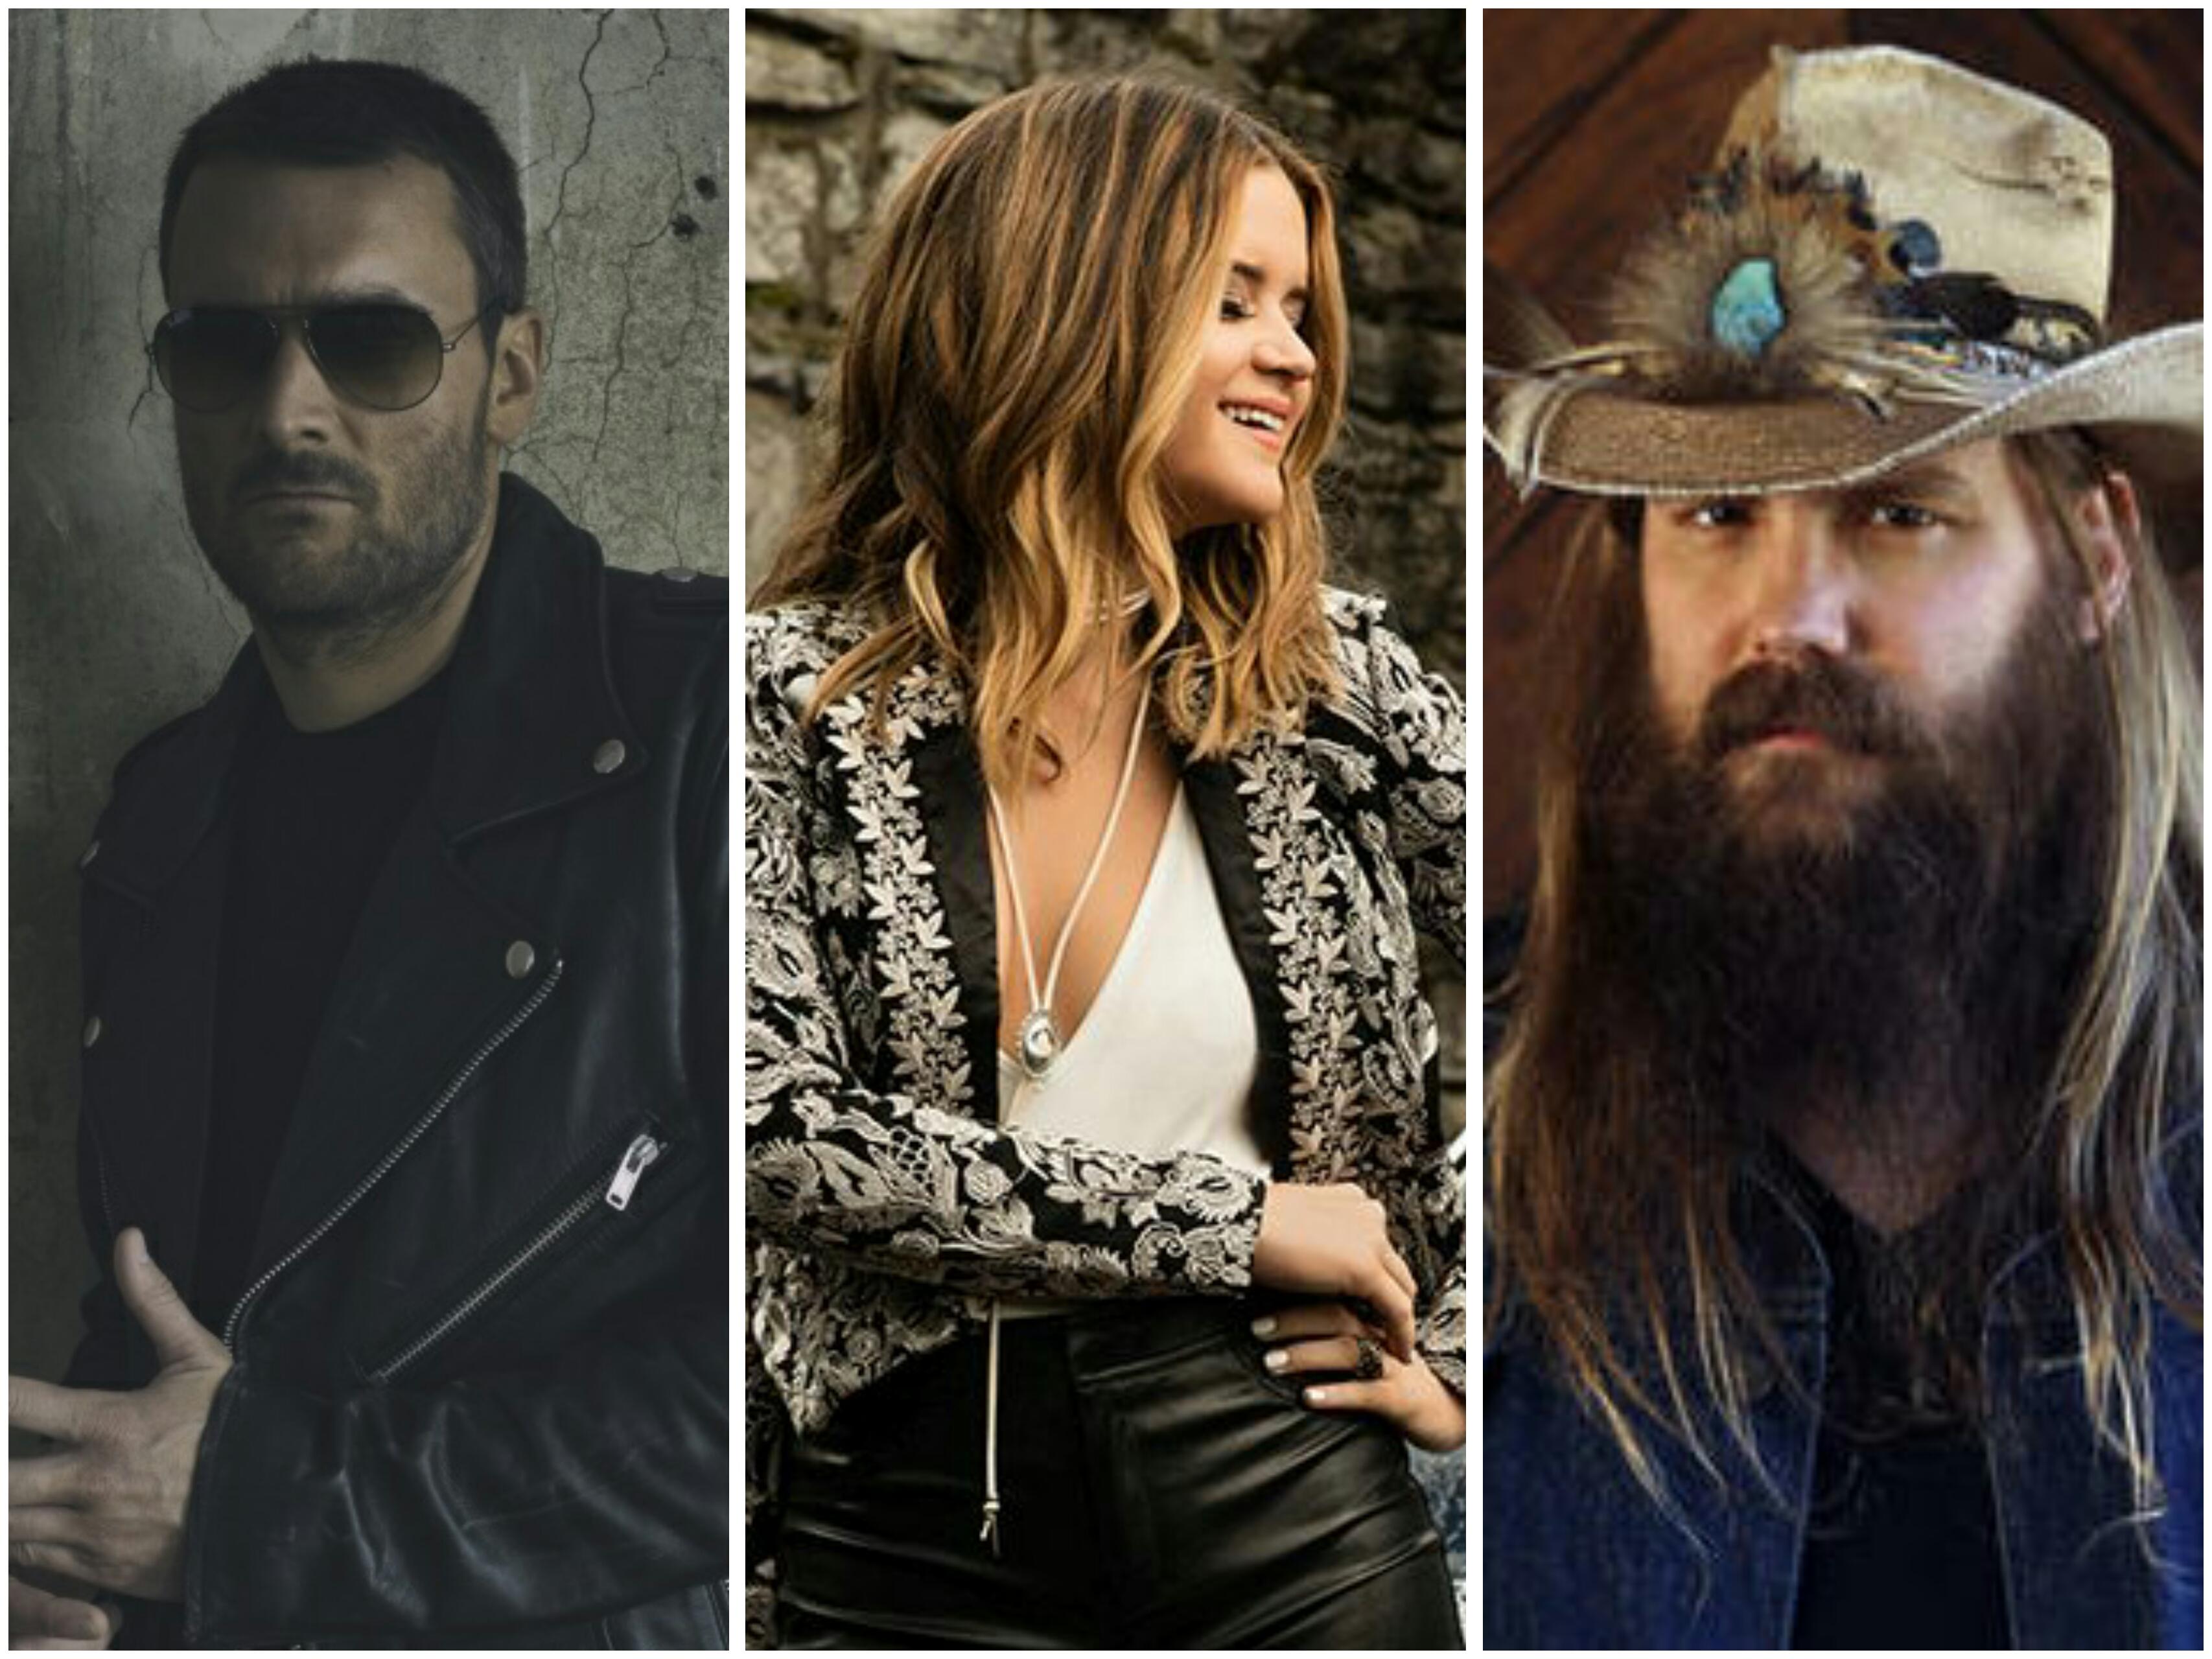 Eric Church, Maren Morris, Chris Stapleton Lead Nominees for 50th Annual CMA Awards